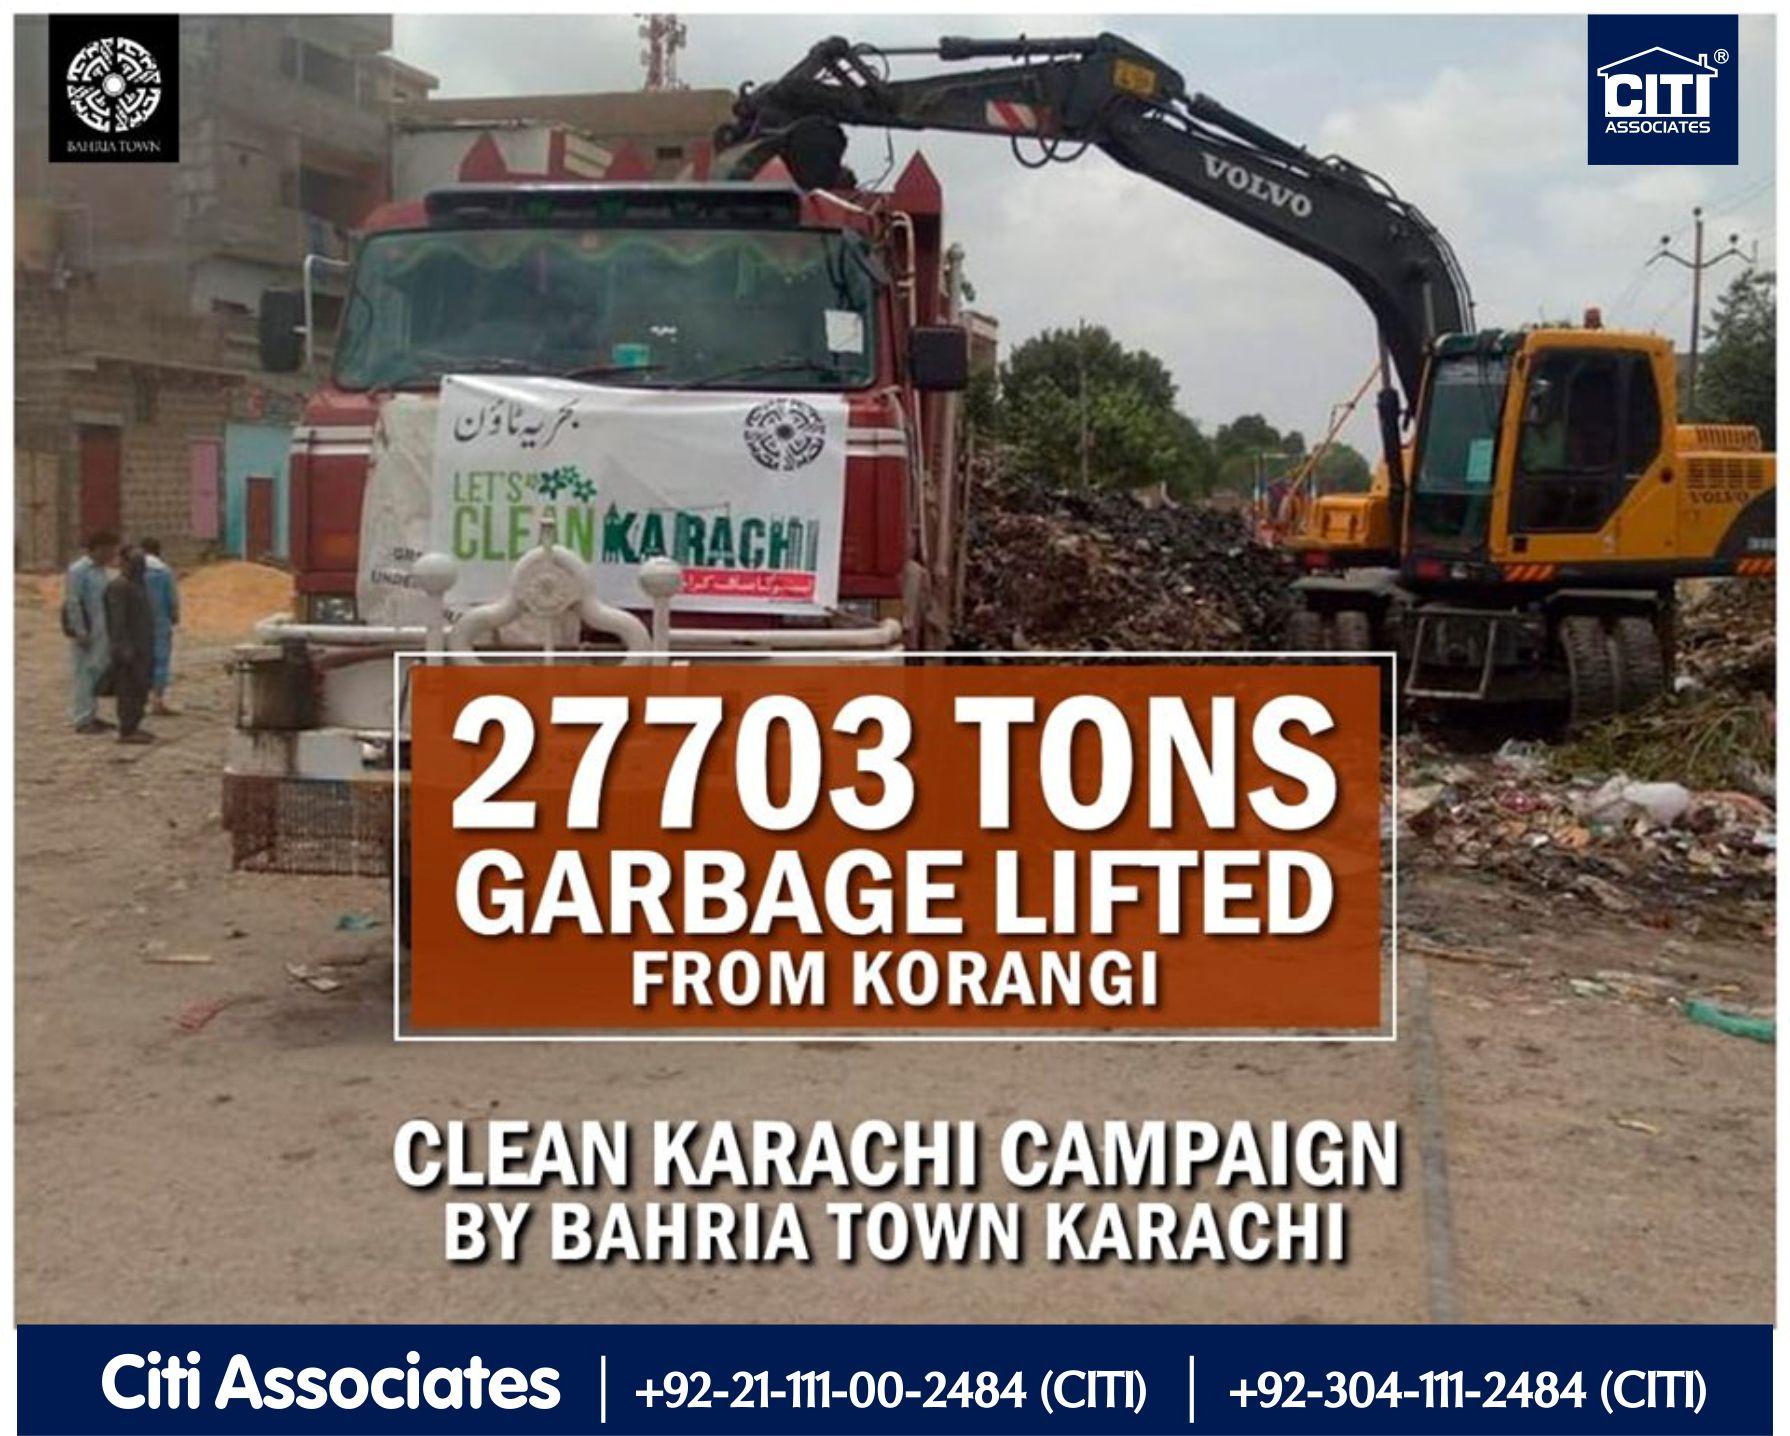 27703 Tons Garbage Lifted from Korangi Karachi by Bahria Town Karachi